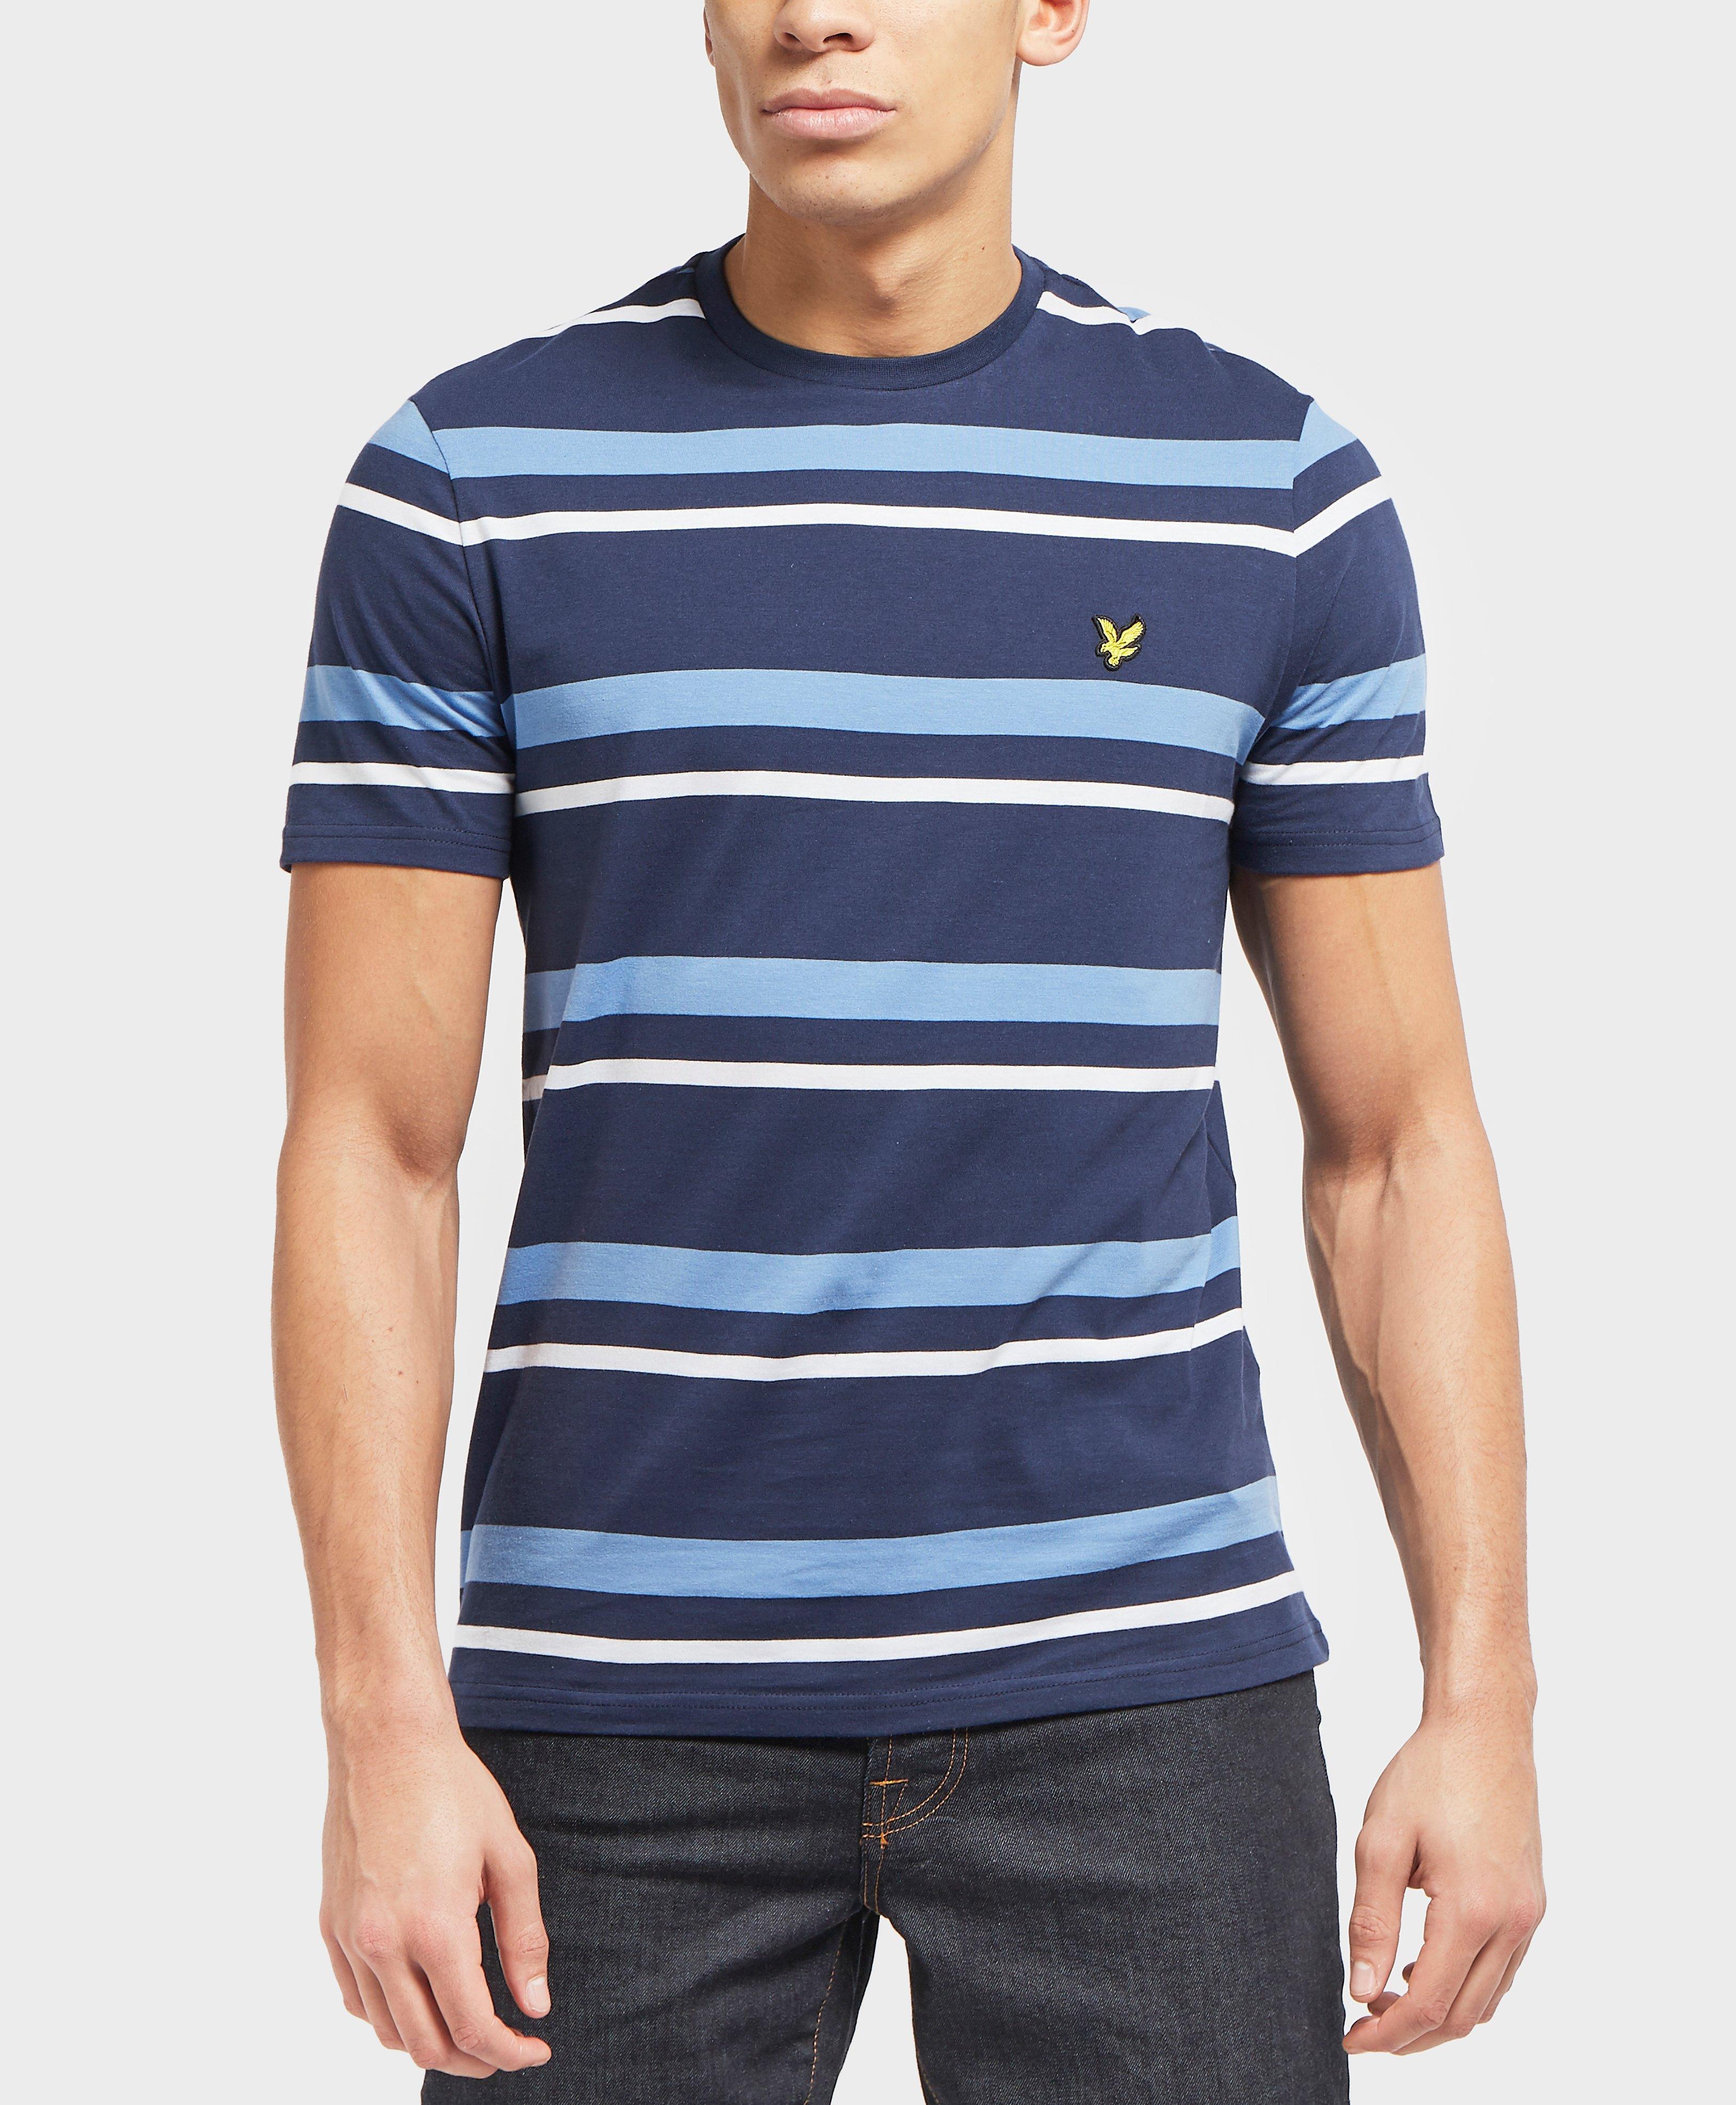 874c08615 Lyst - Lyle & Scott Stripe Short Sleeve T-shirt in Blue for Men